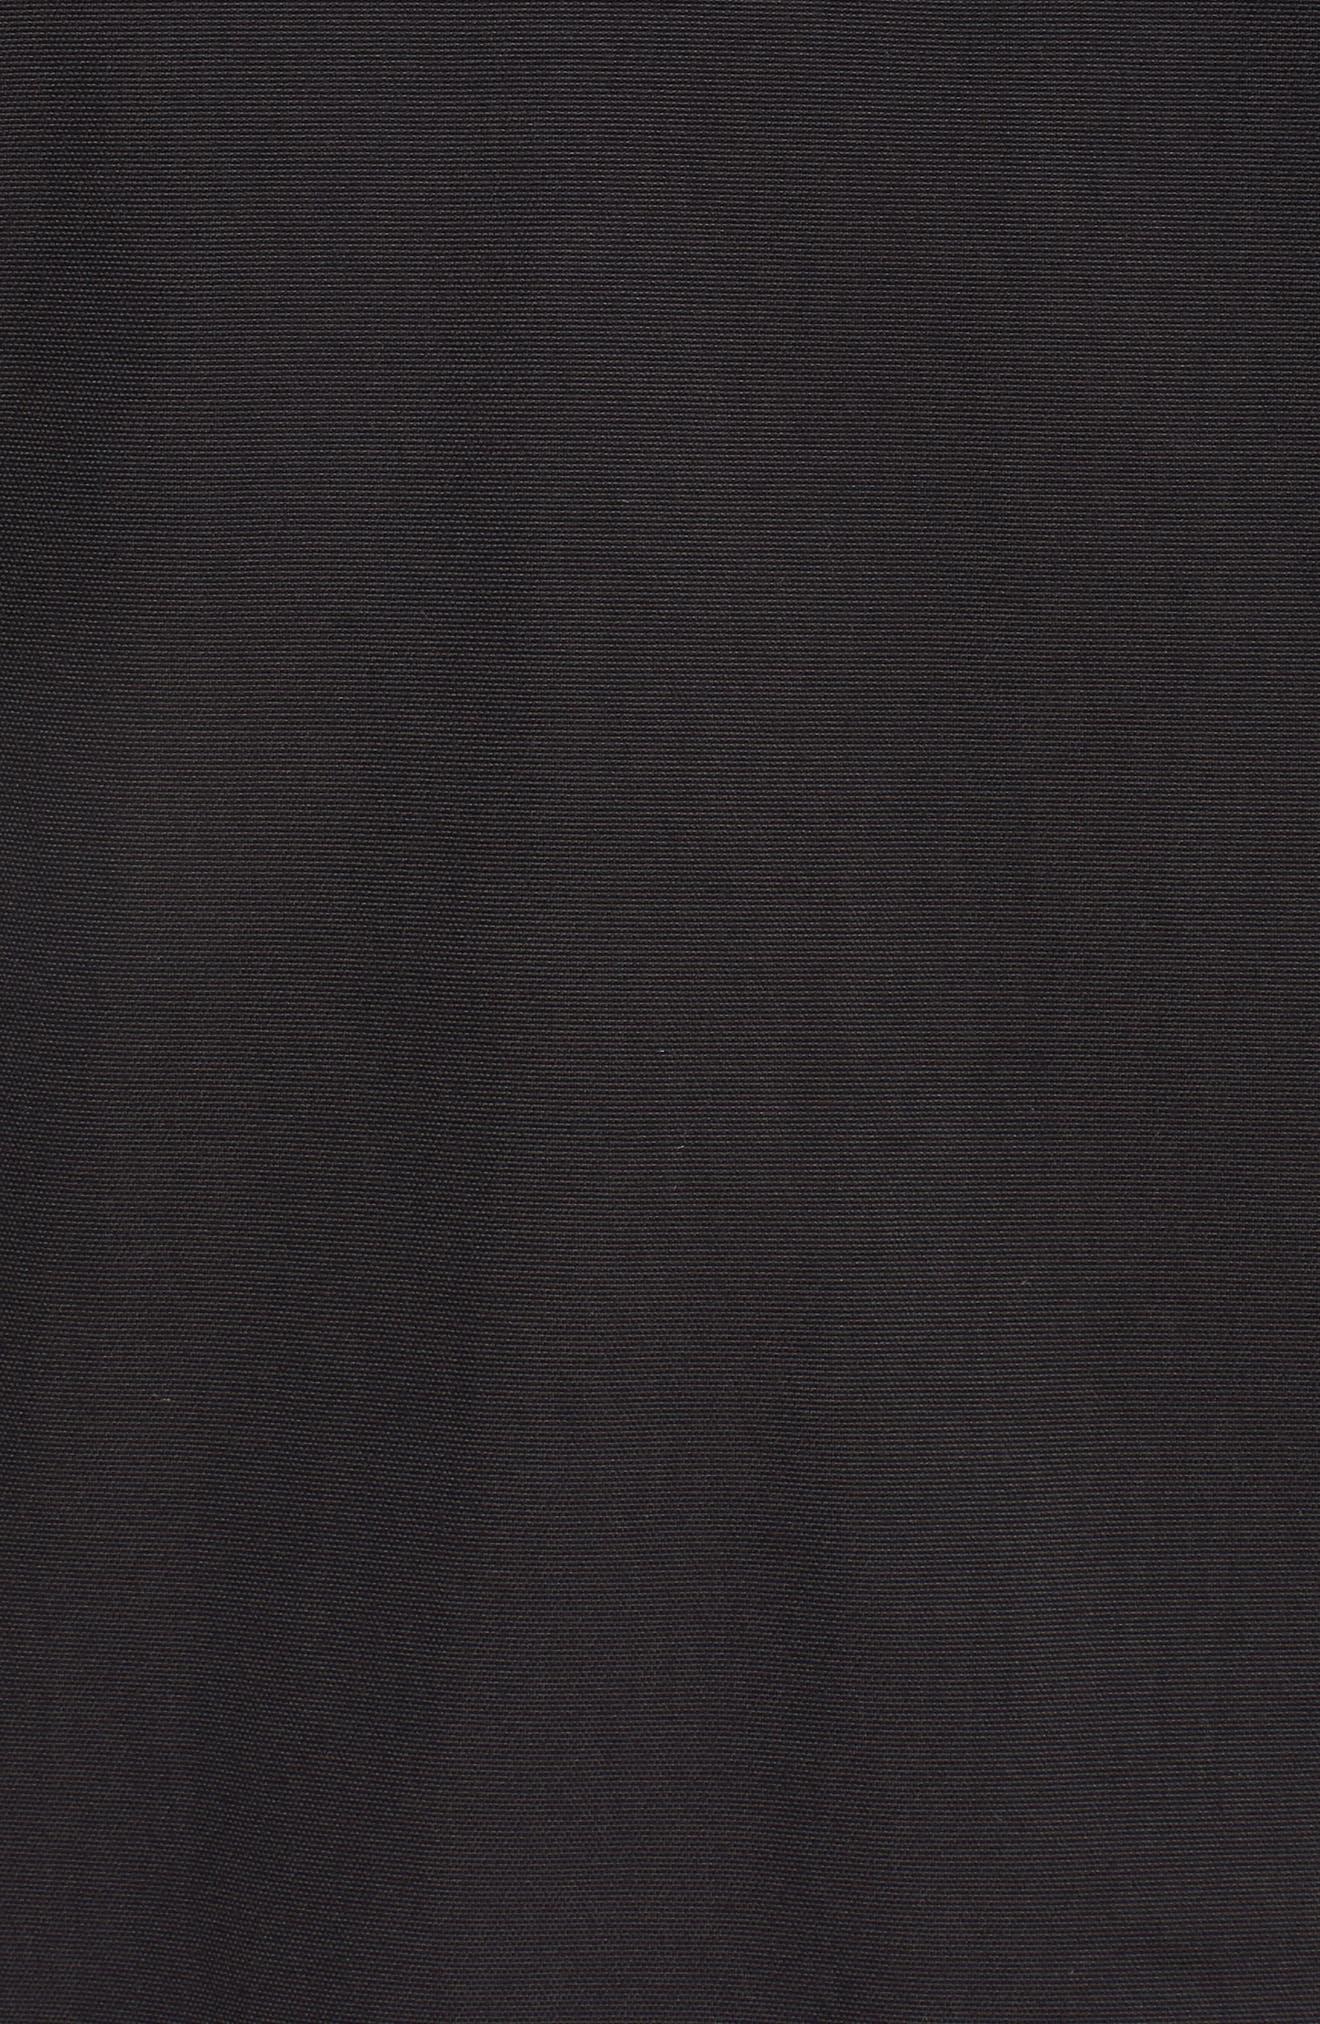 Bardu Waterproof Bomber Jacket with Detachable Hood and Faux Fur Trim,                             Alternate thumbnail 7, color,                             BLACK